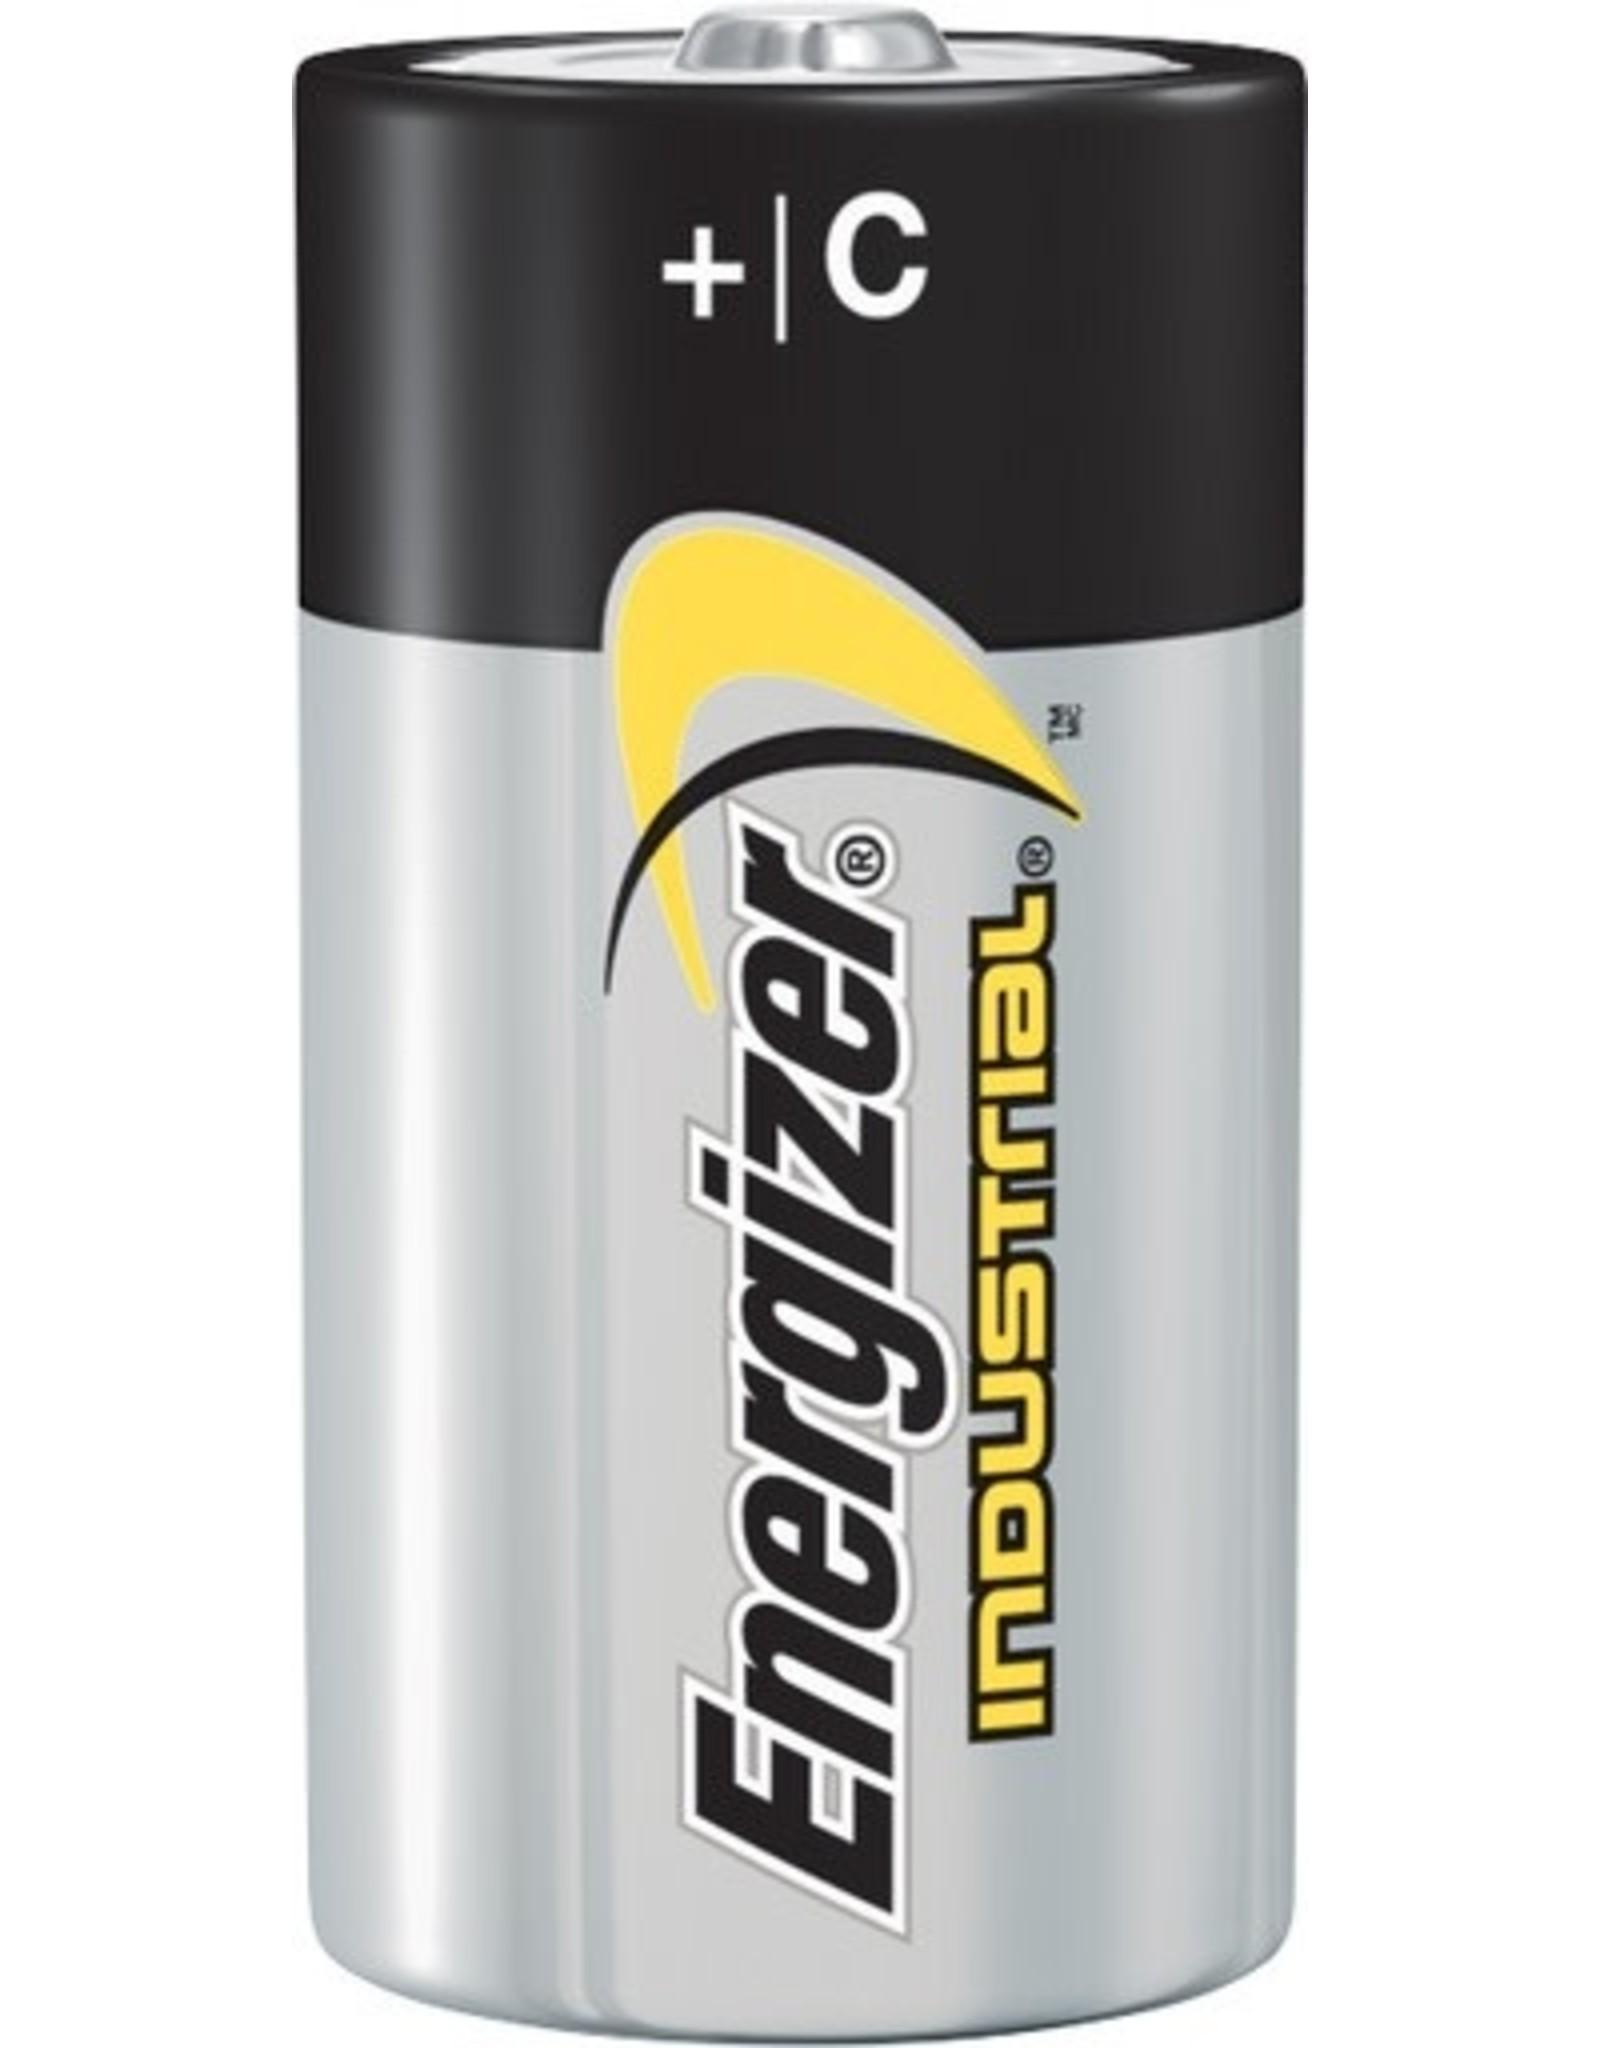 Energizer Inst. Energizer Industrial C-Battery 12-pack